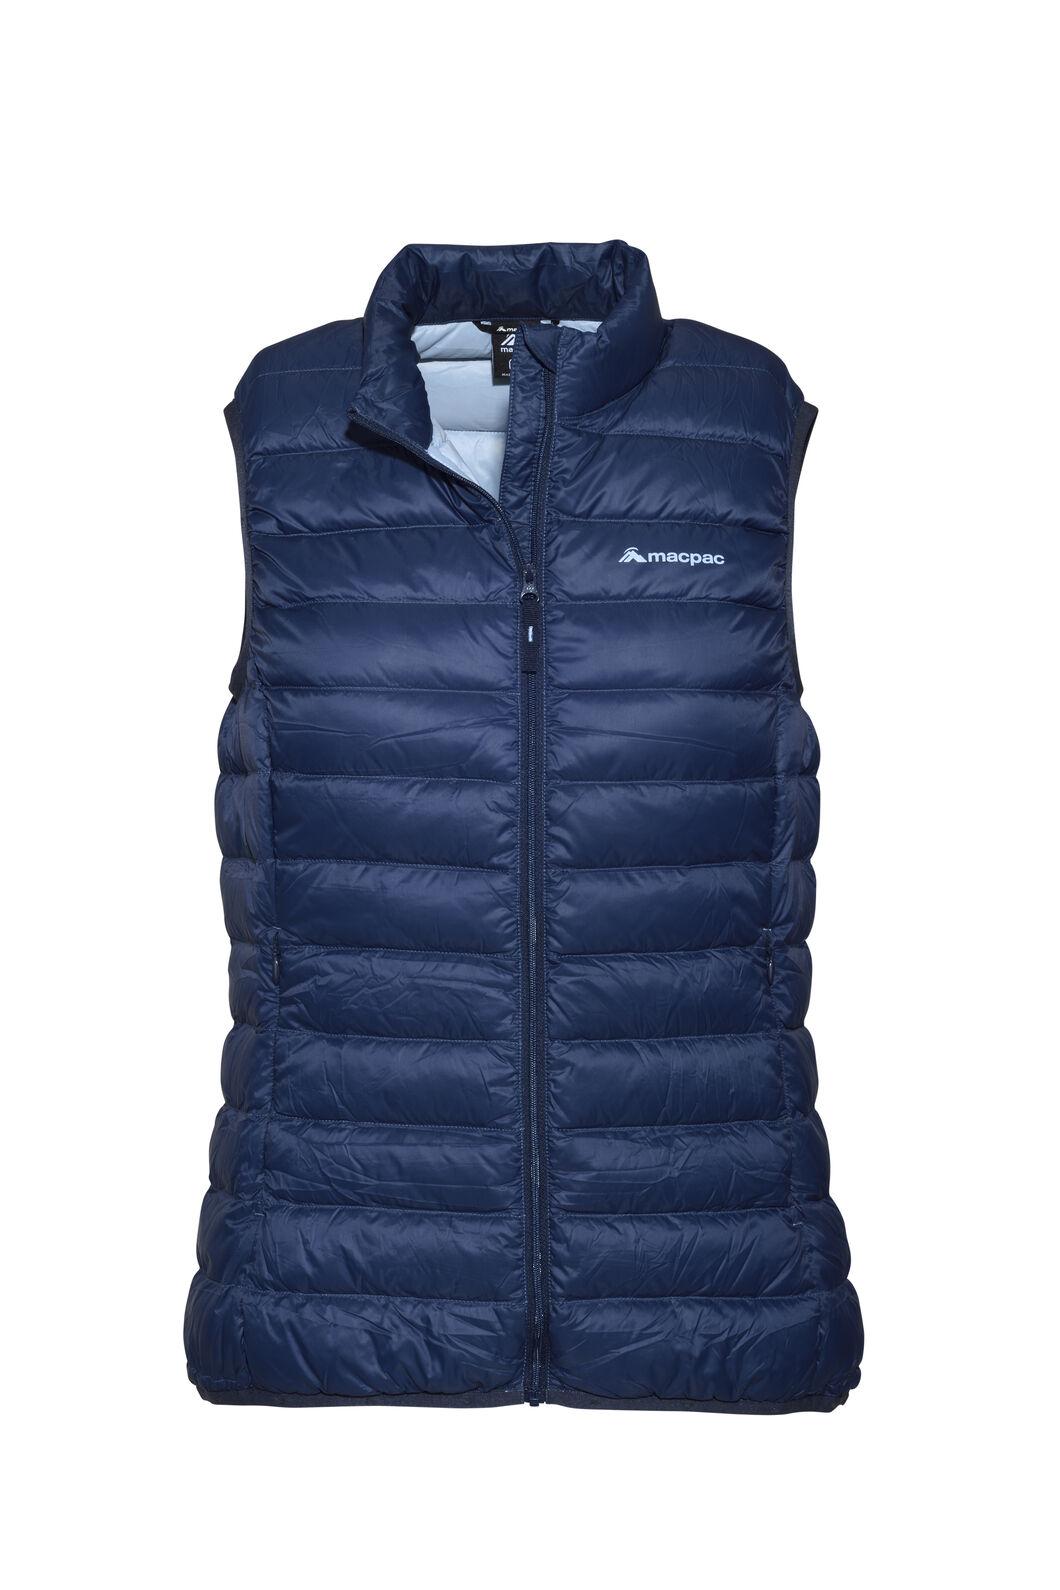 Macpac Uber Light Down Vest — Women's, Black Iris/Blue Fog, hi-res